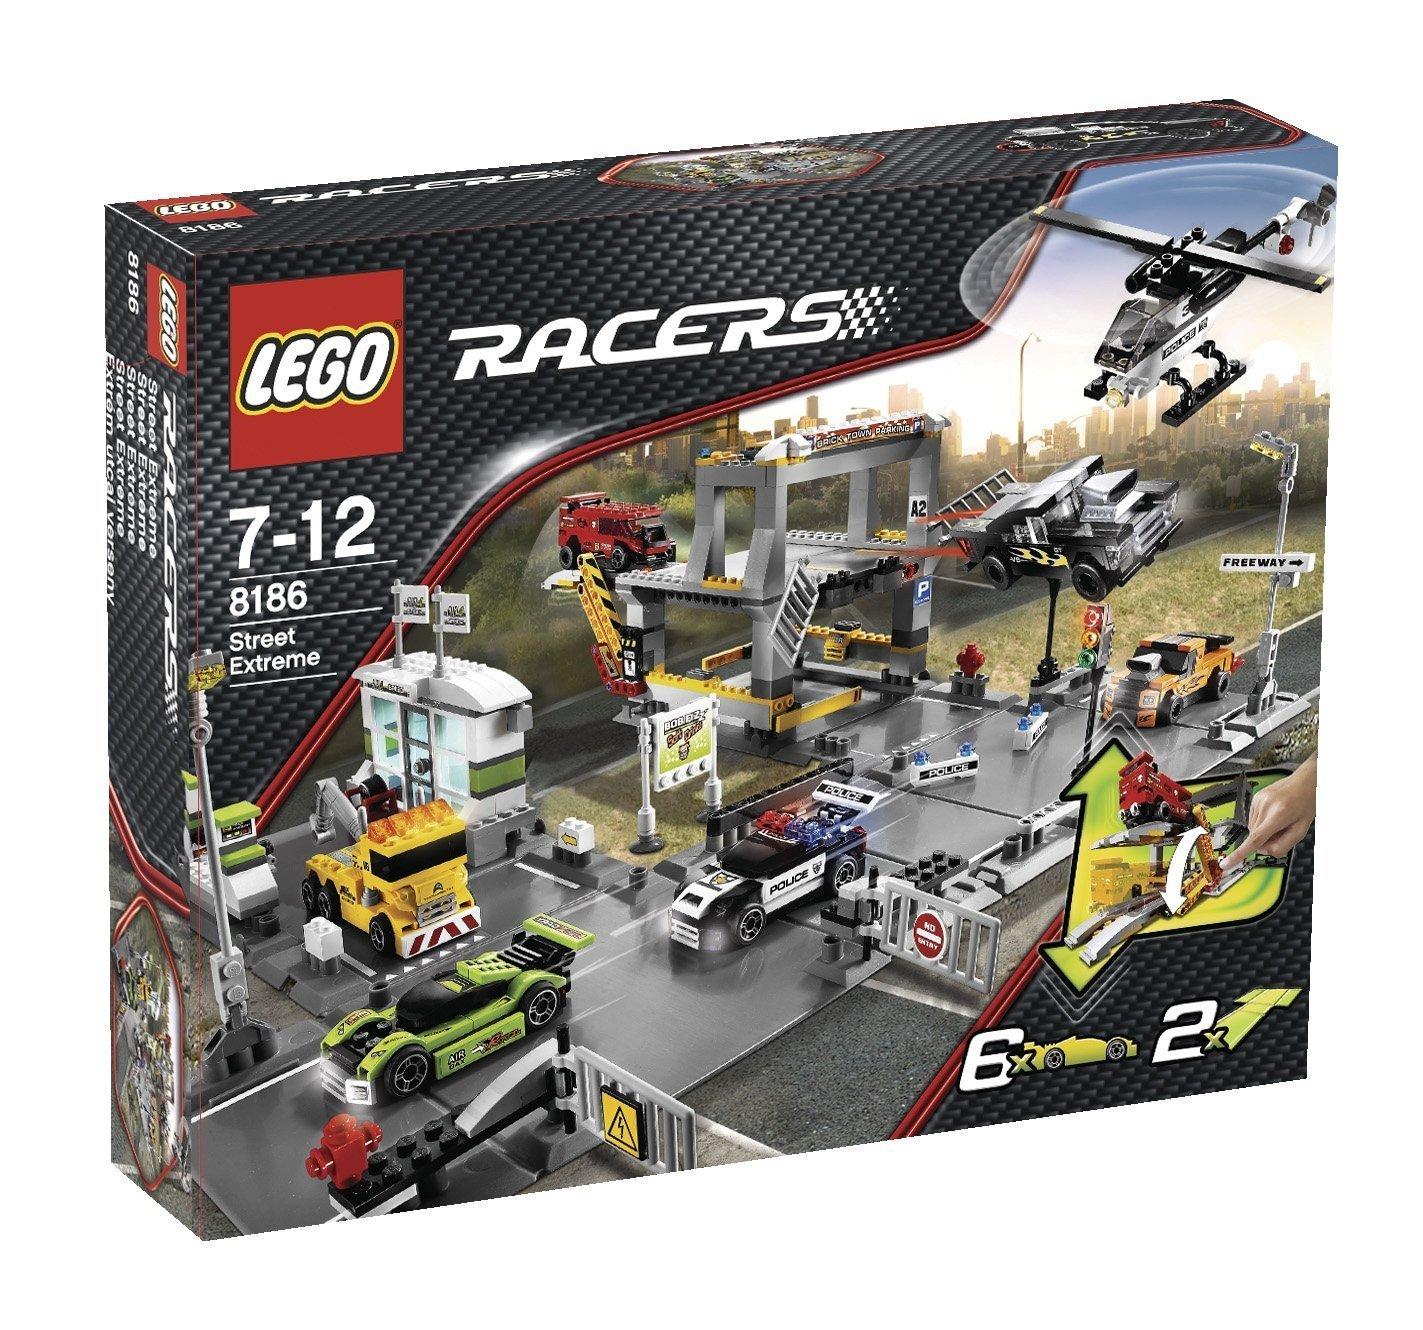 LEGO Racers 8186 8186 8186 - Street Extreme 434218